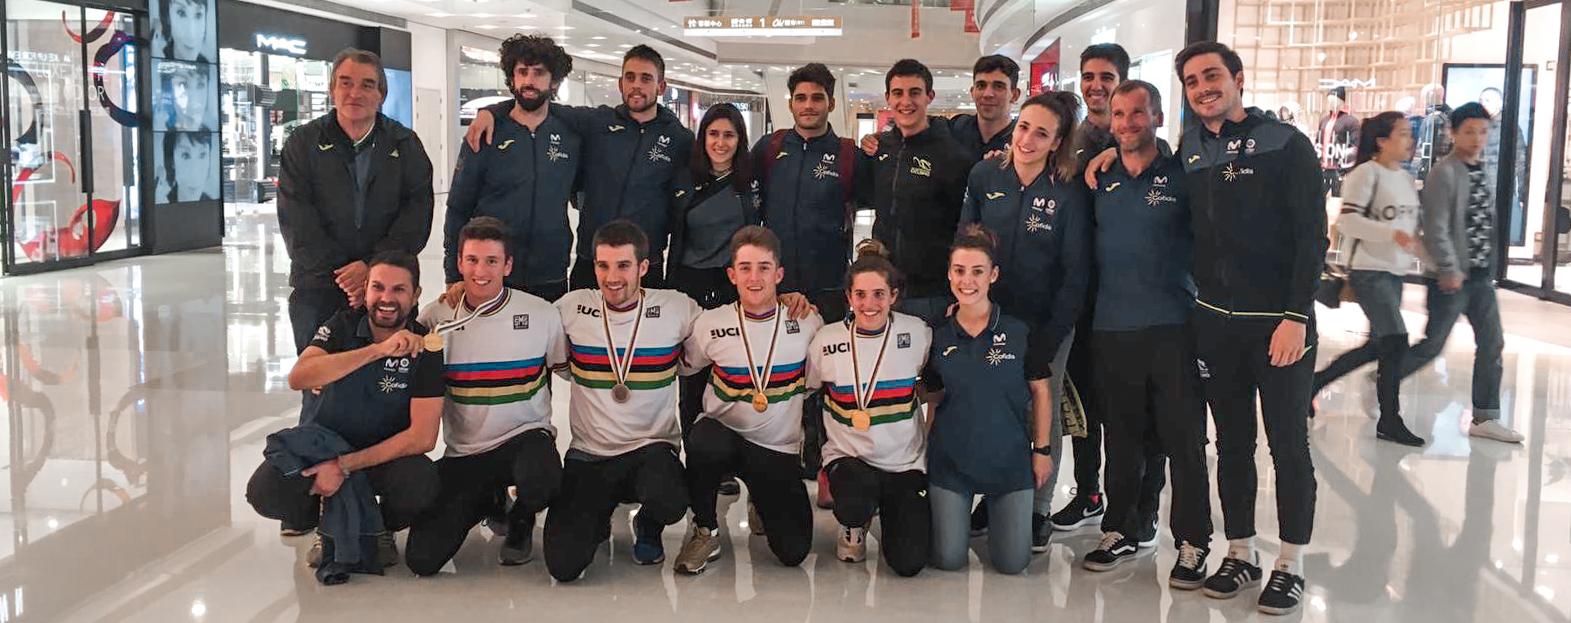 The whole Spanish Team (Trial, BMX and MTB Eliminator)